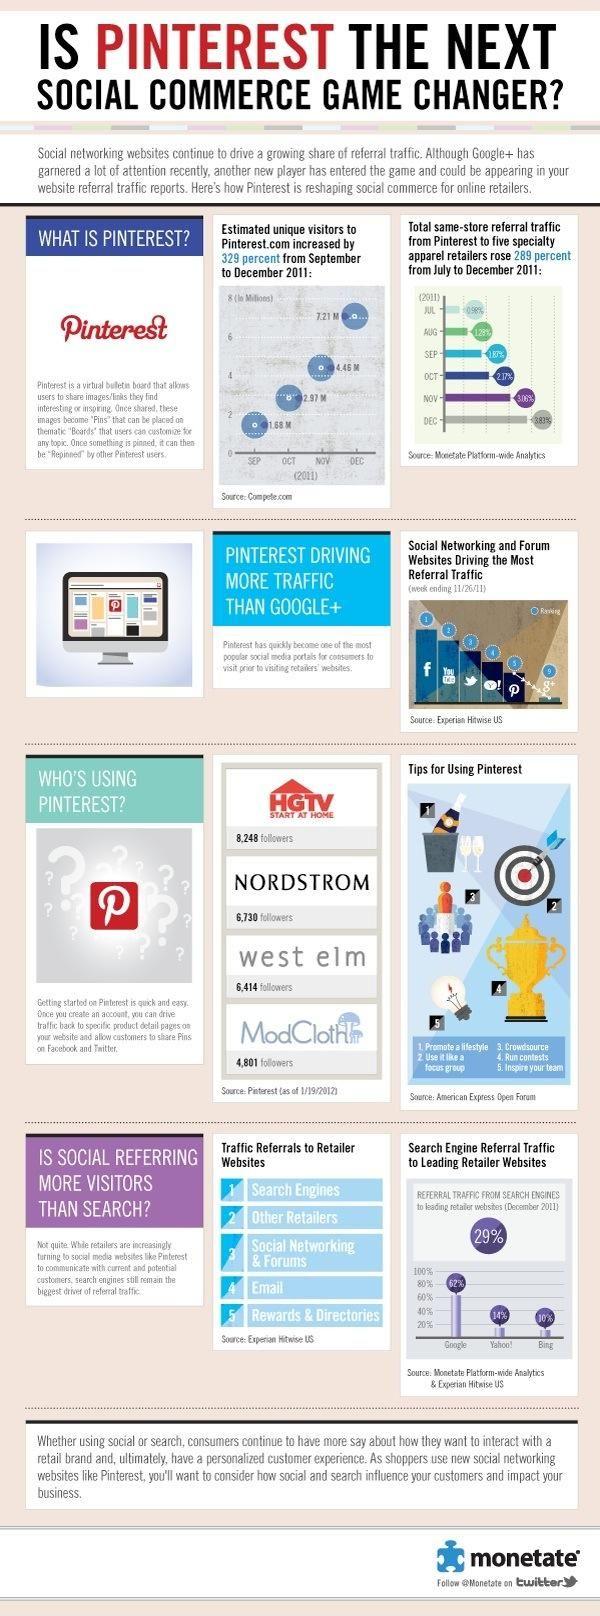 Pinterest Drives More Traffic to Retailers #socialmedia #pinterest